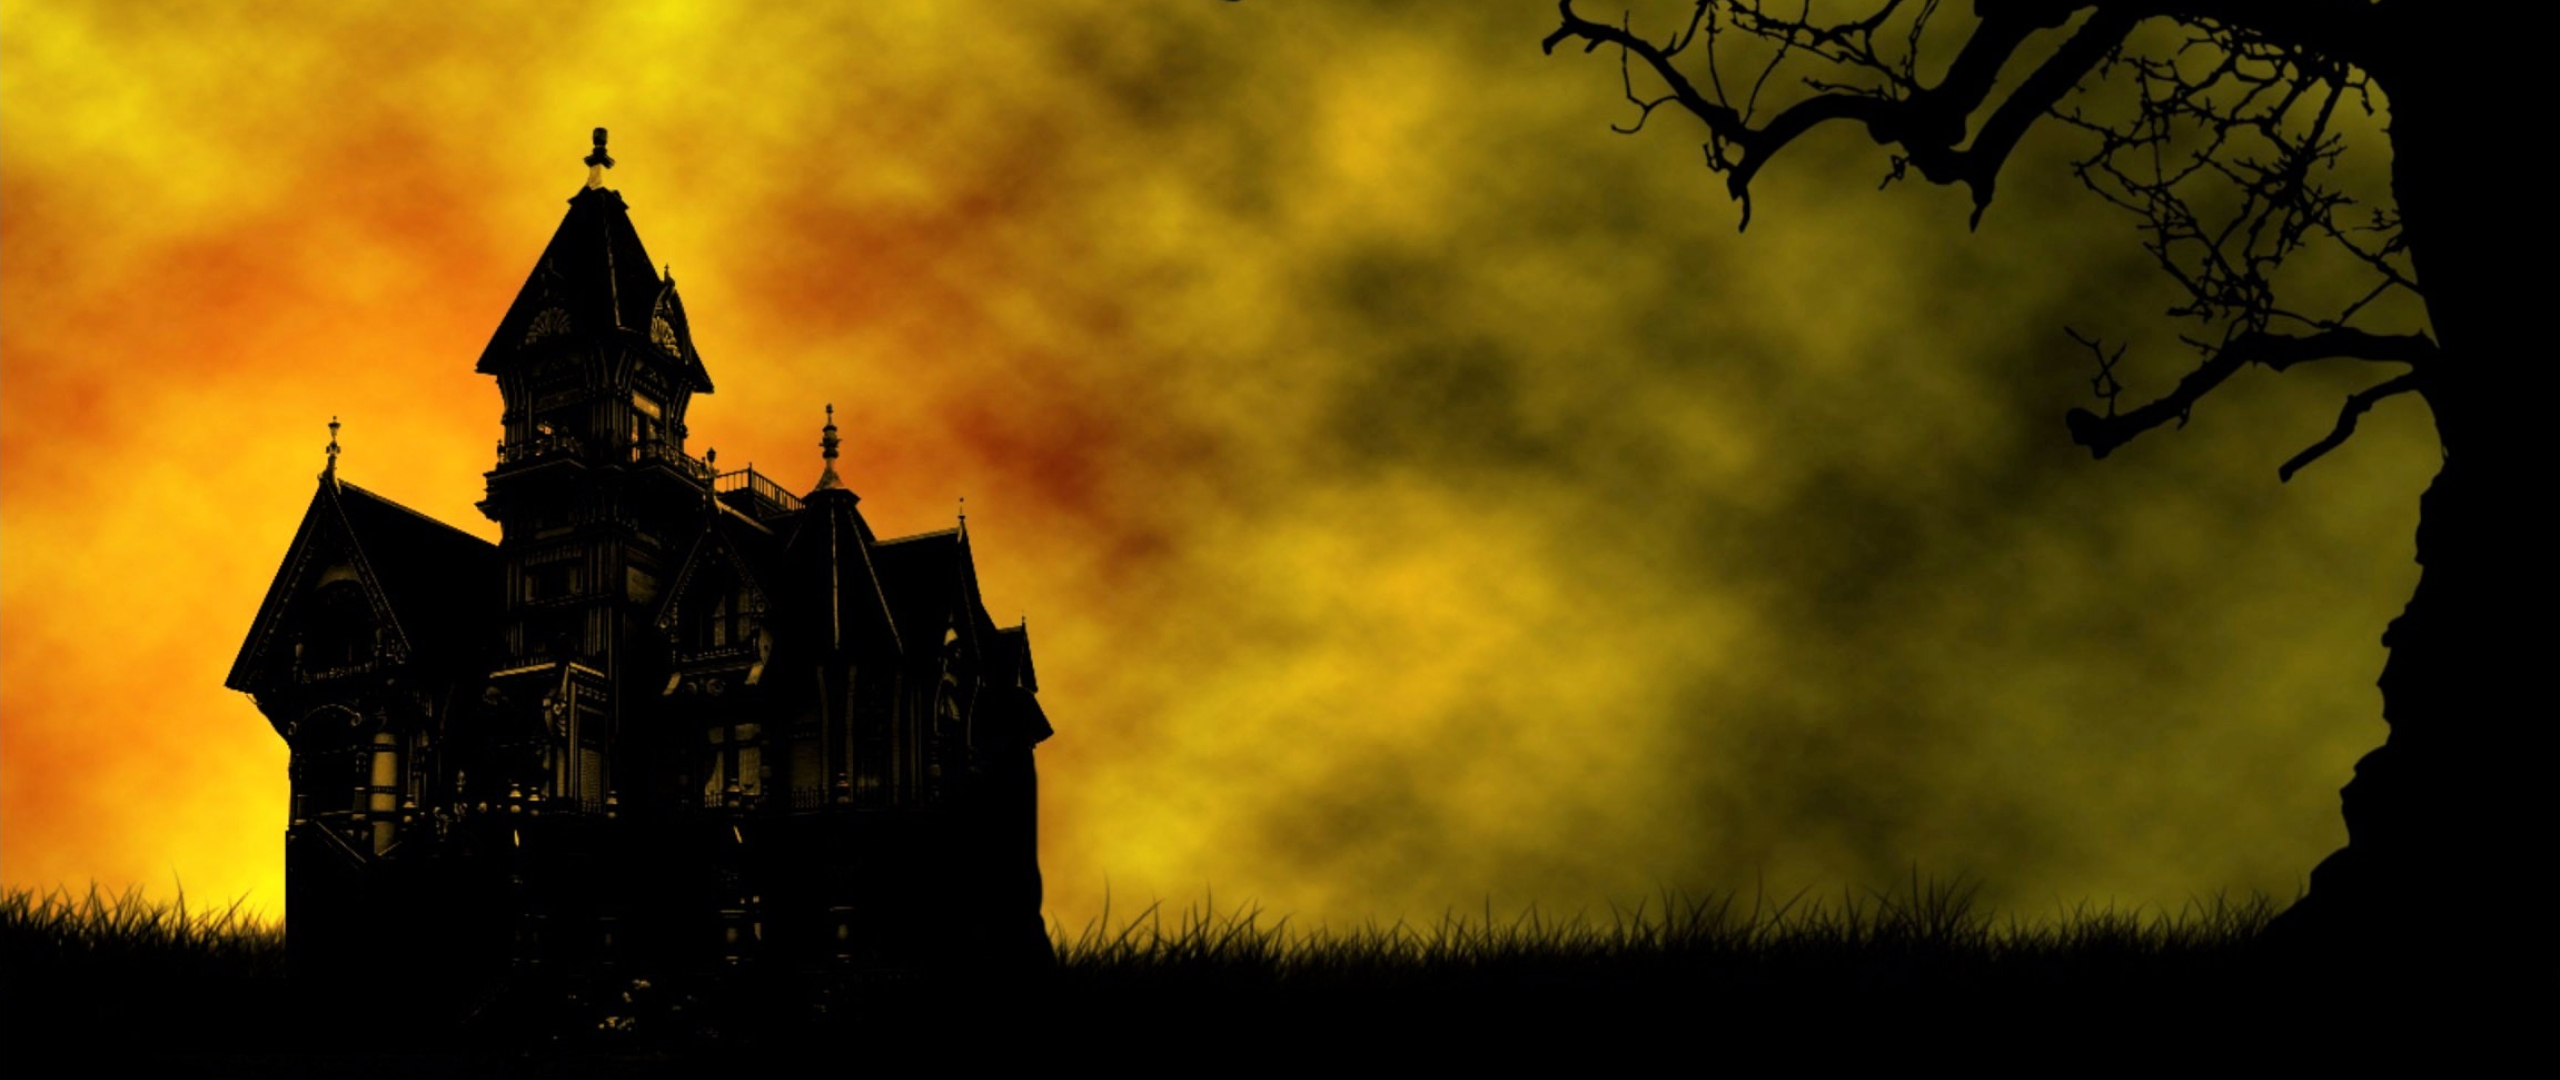 Haunted house full hd 2k wallpaper for House image full hd